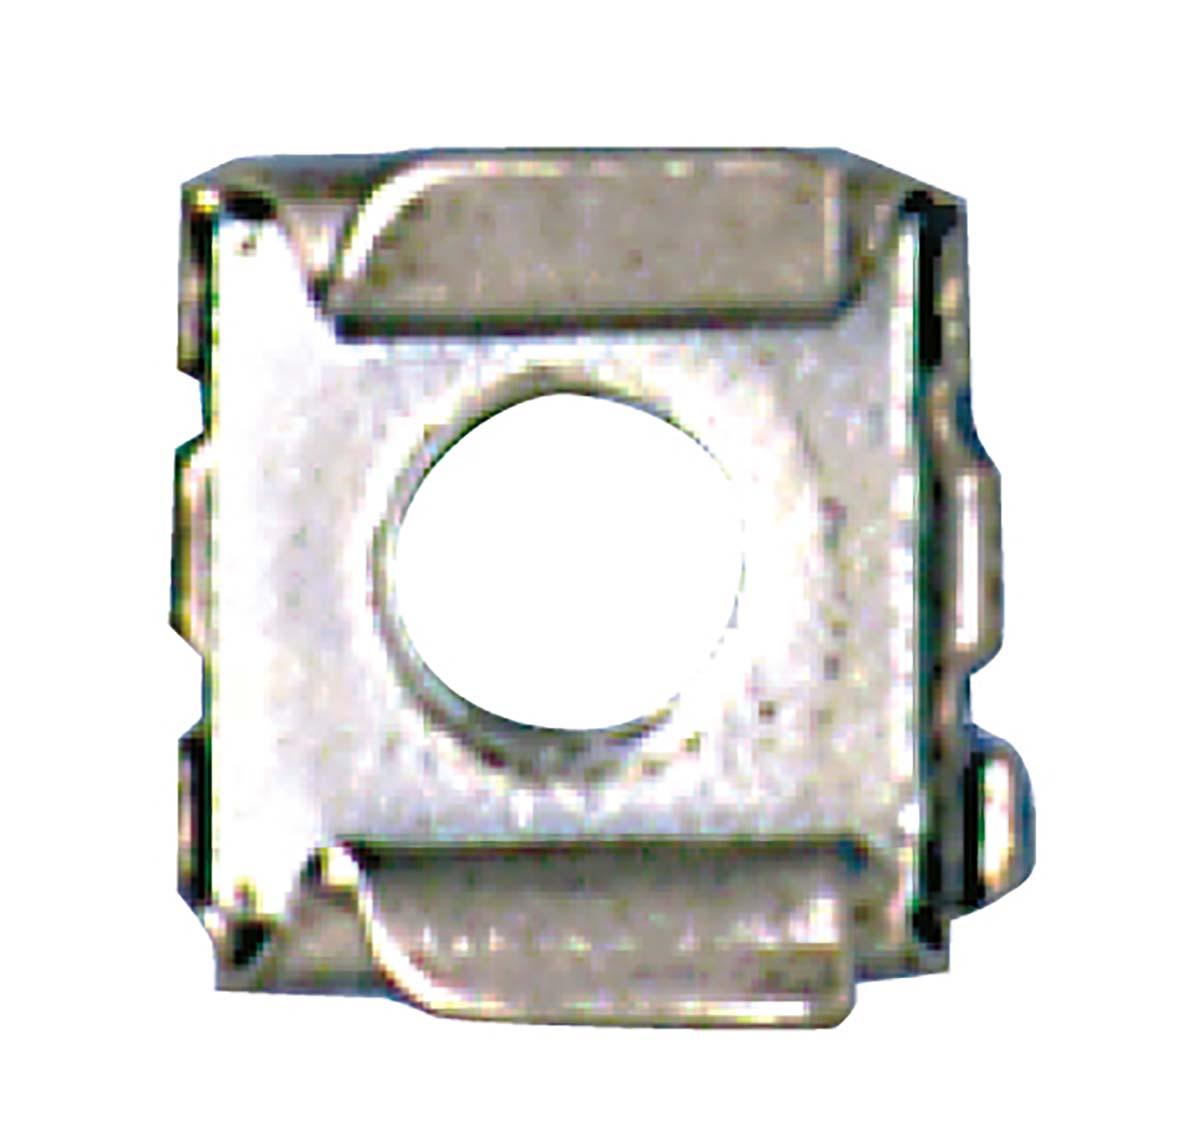 Autoclips TCA CAJON C/TCA.6 MM-E/C 5.5 MM-9.5 X 11 MM AZUL